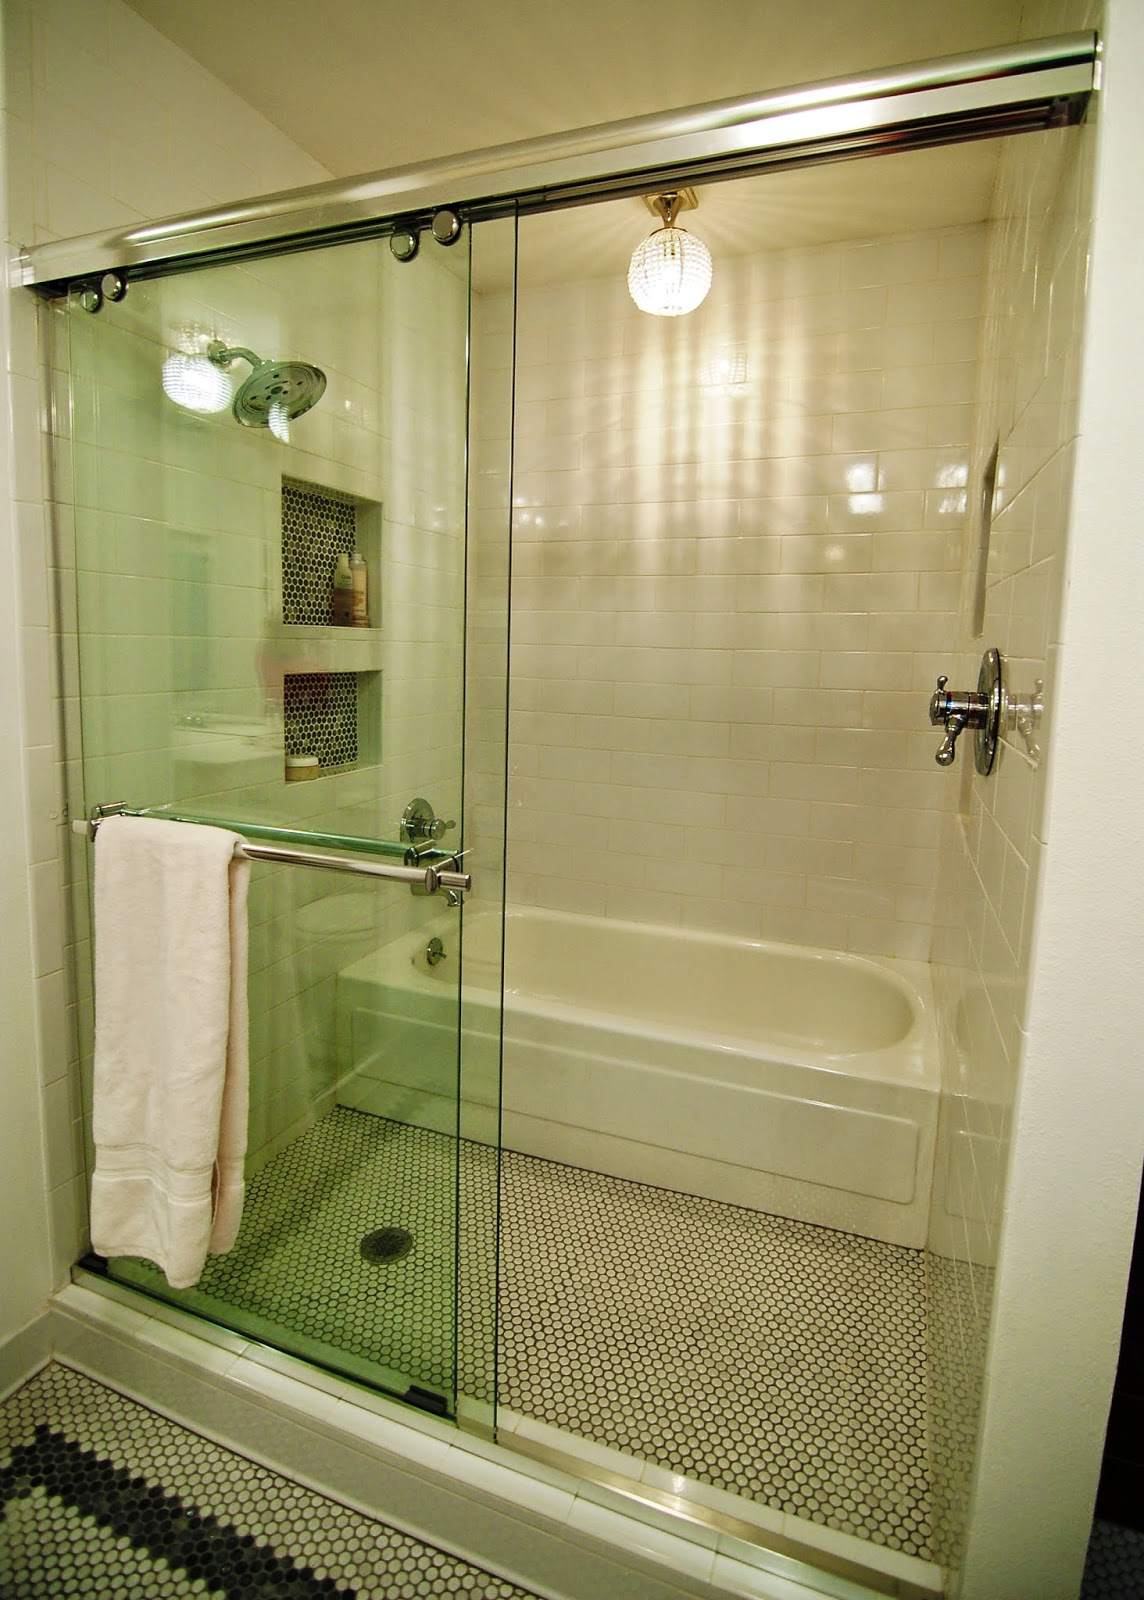 north dallas real estate: lydia's north dallas bathroom remodel